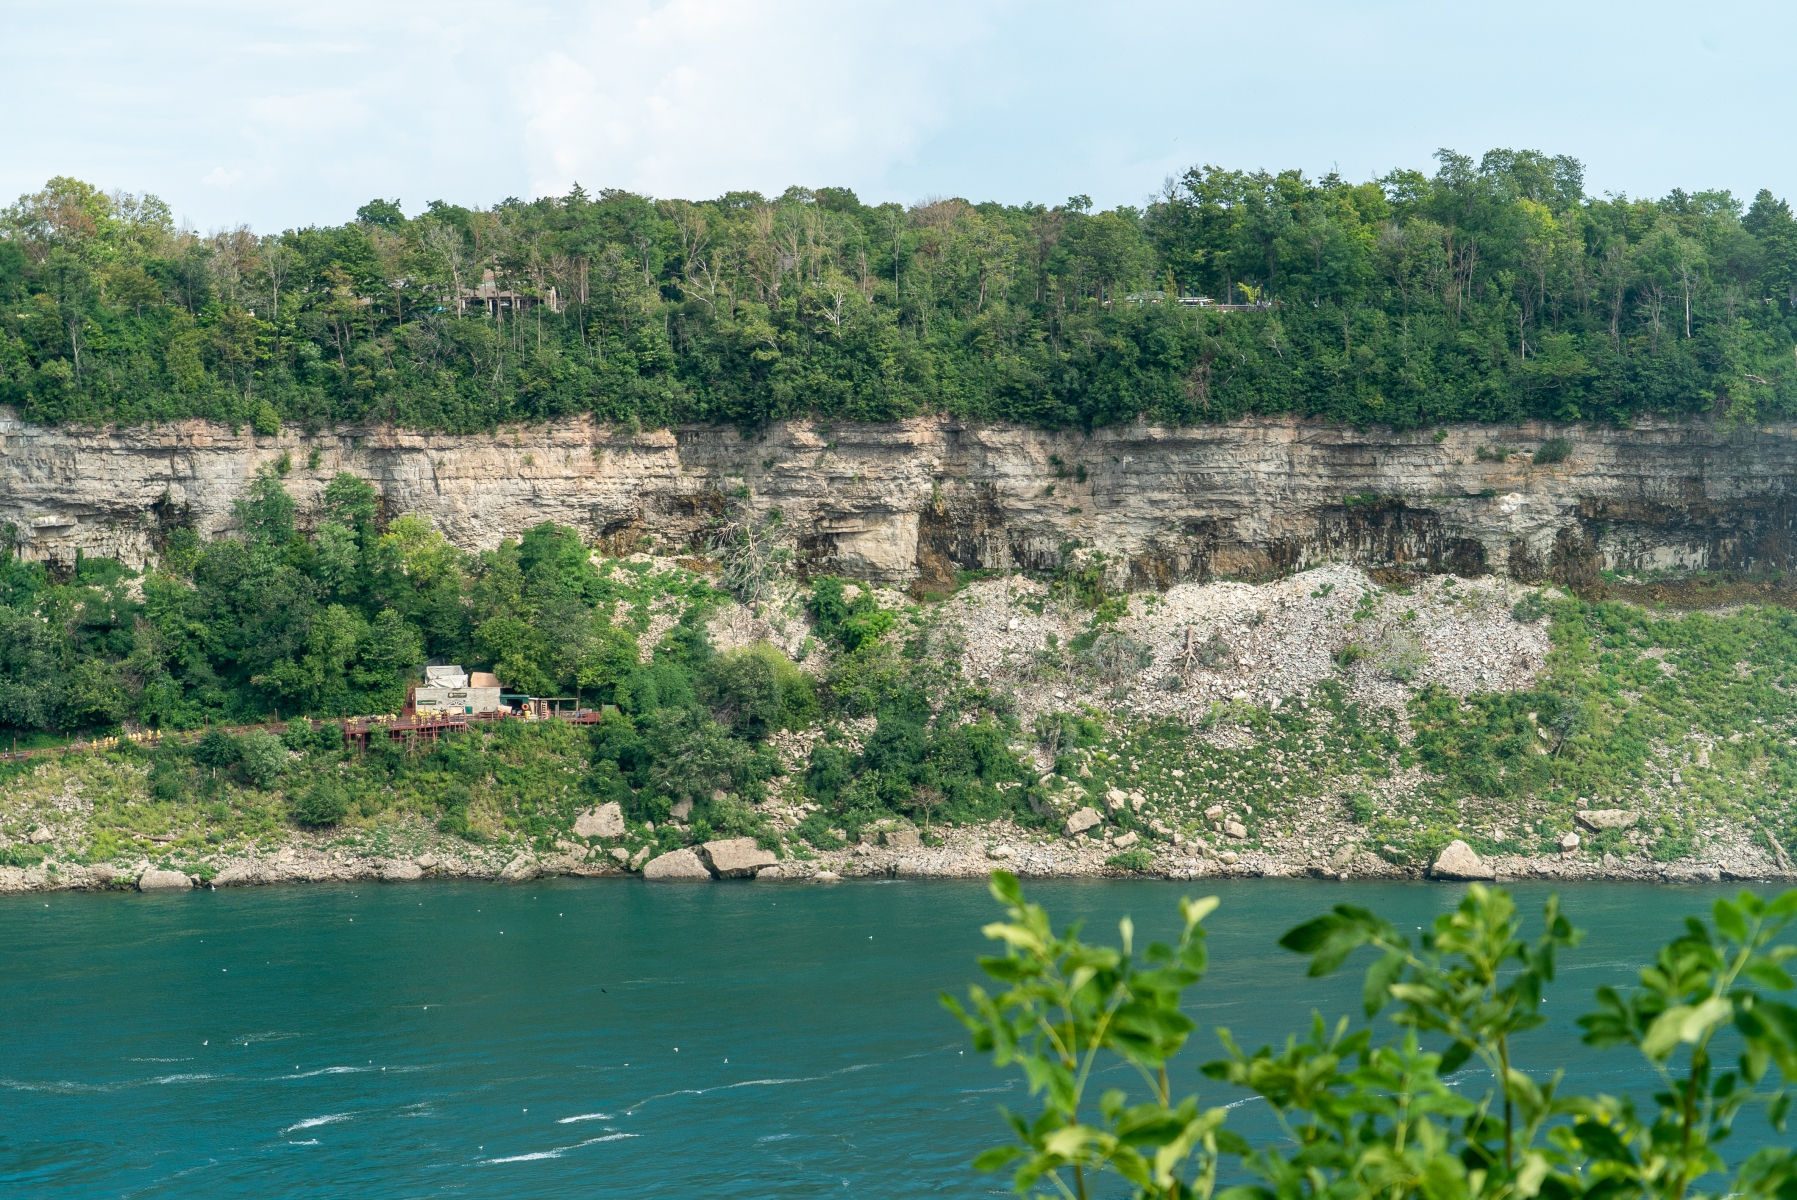 Niagara gorge wall